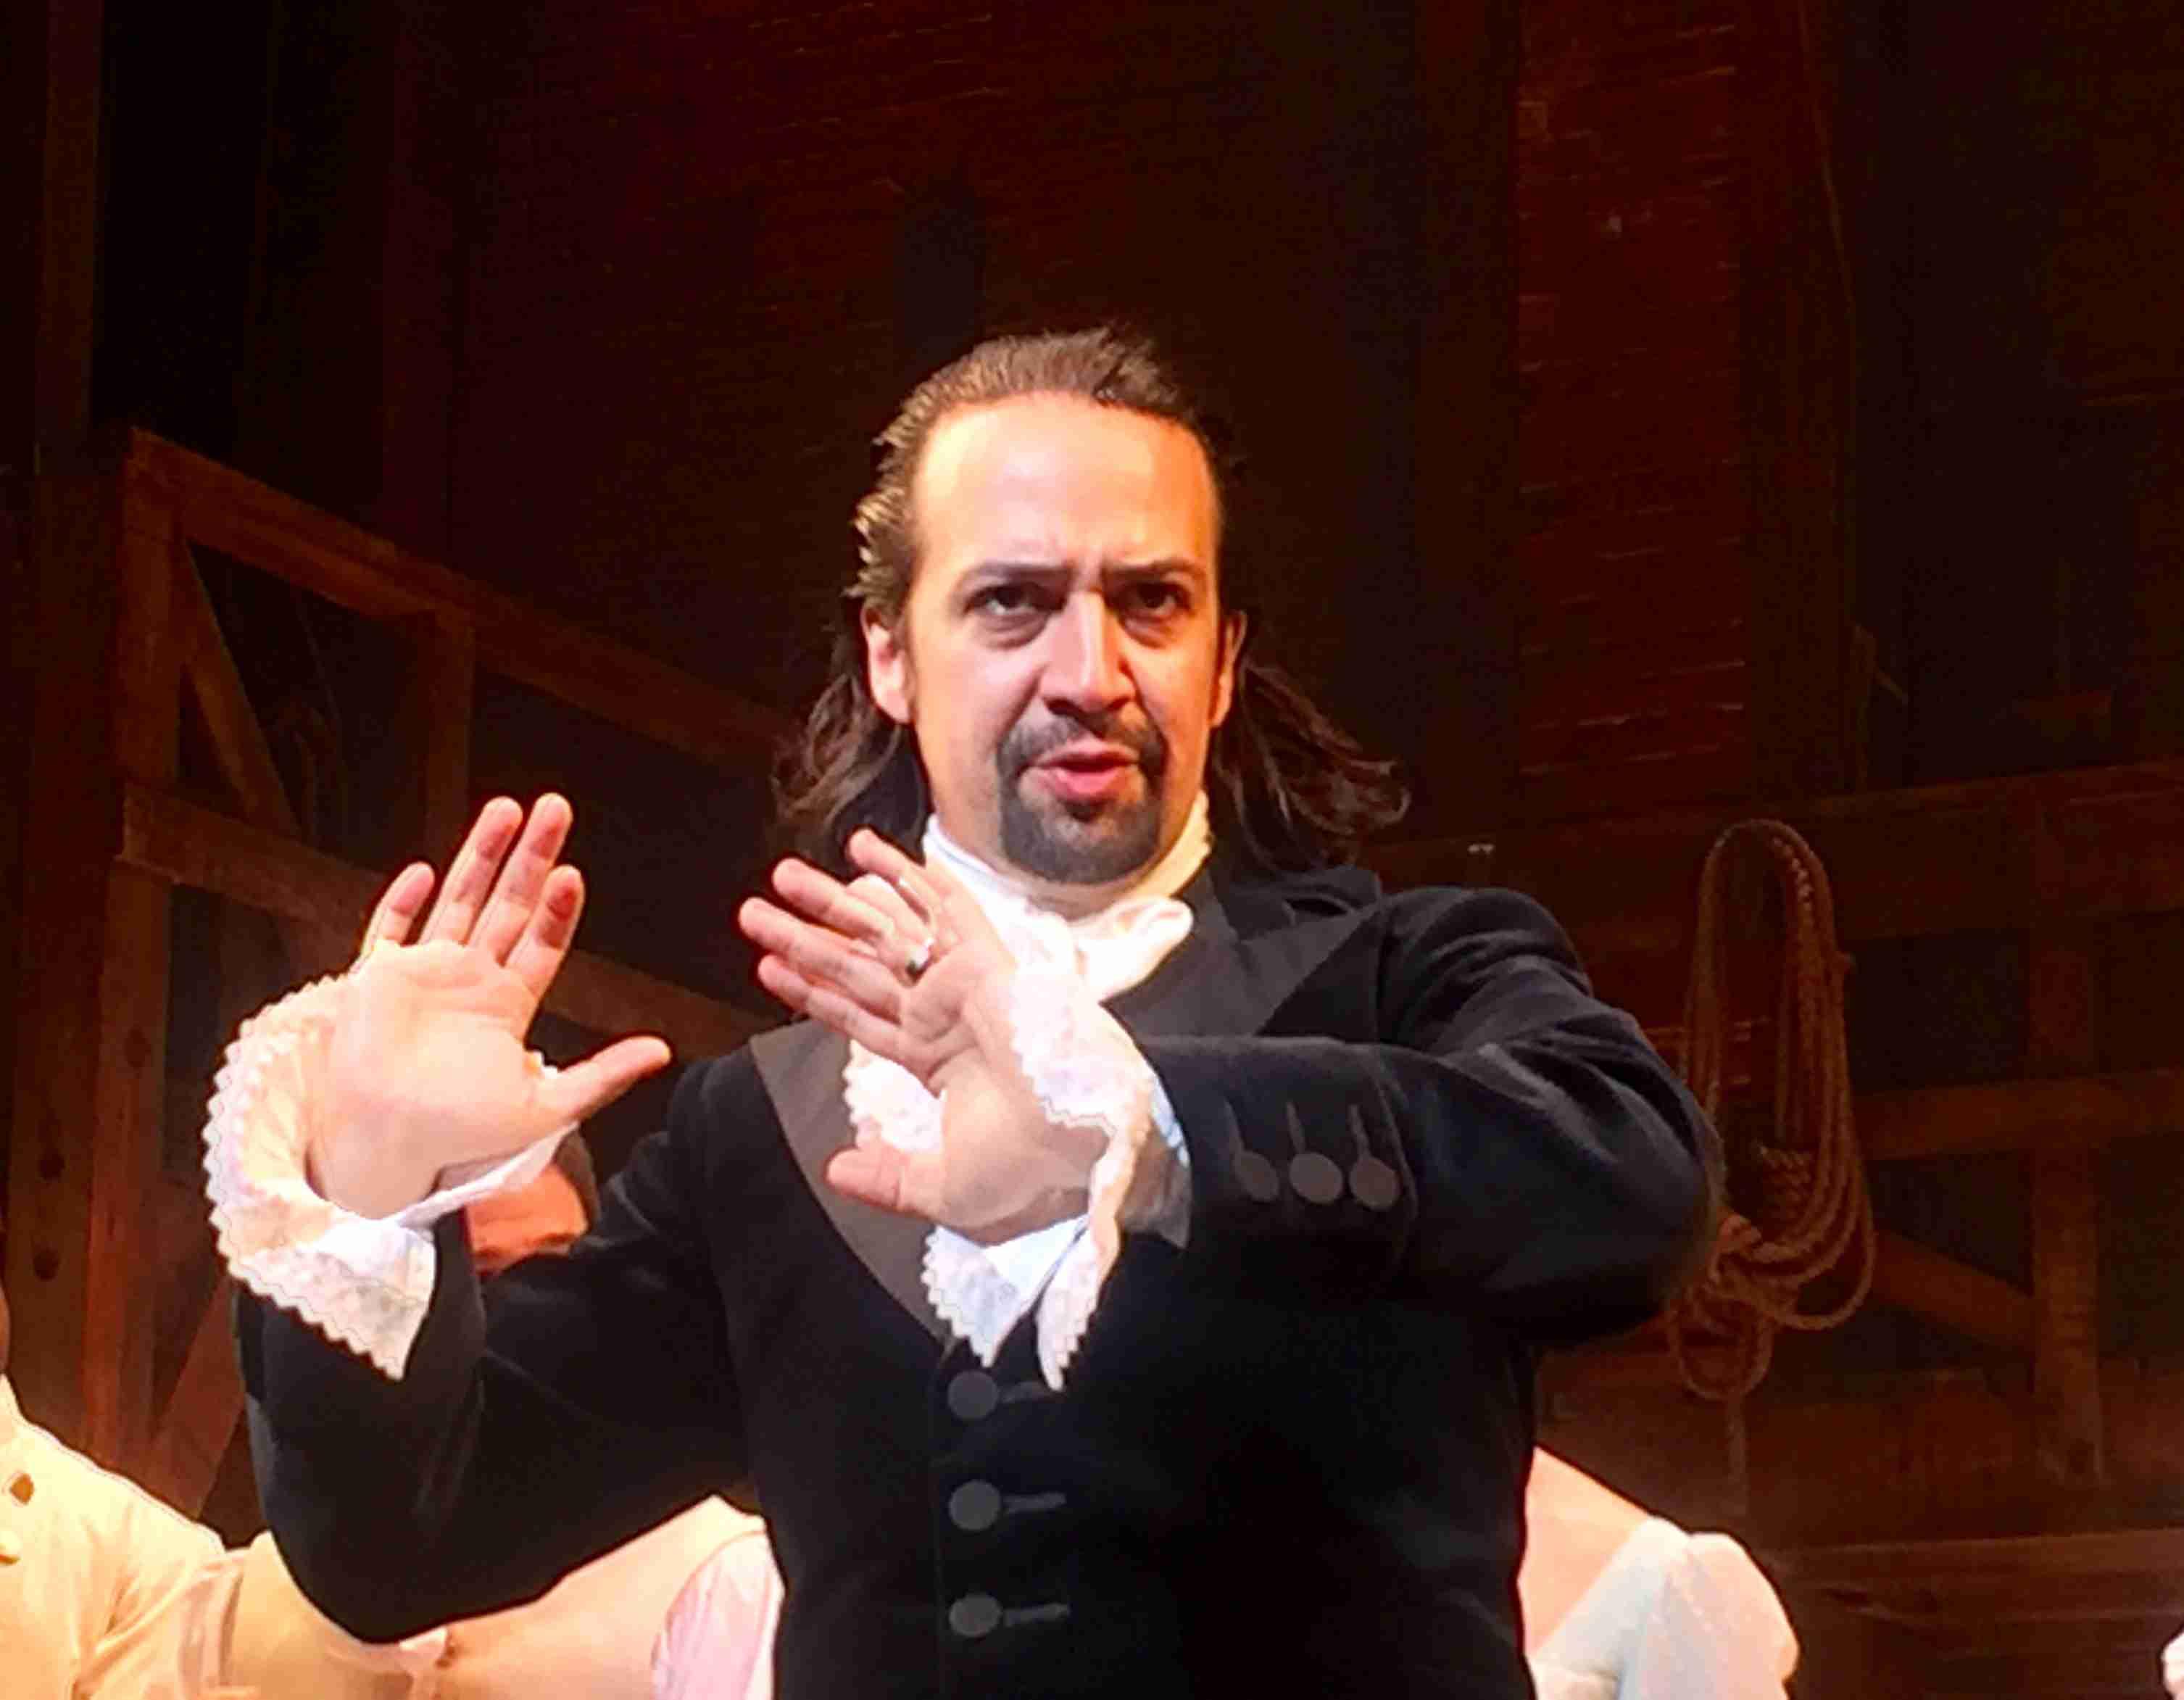 Hamilton creator Lin-Manuel Miranda in performing as the titular Alexander Hamilton.